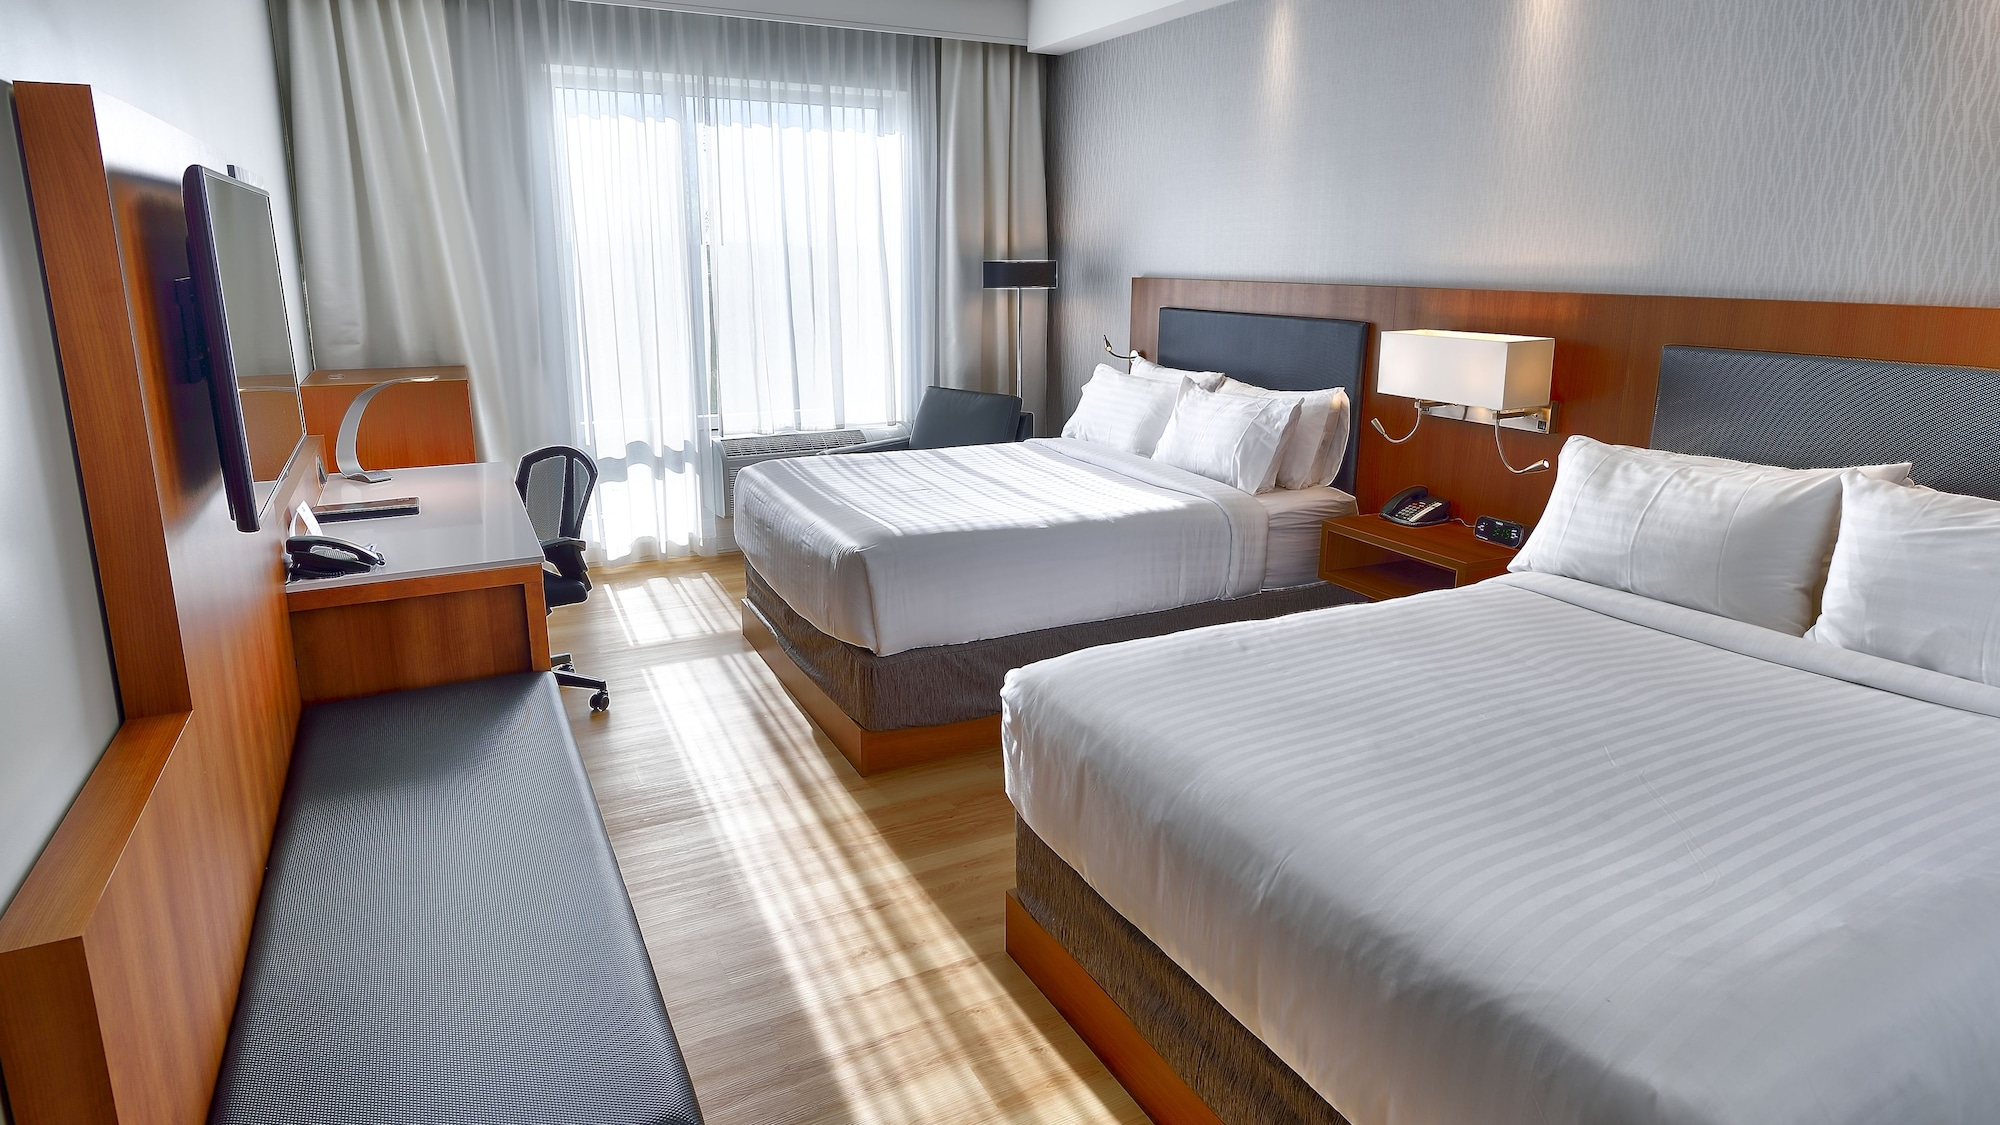 Holiday Inn Express & Suites Vaudreuil, Vaudreuil-Soulanges